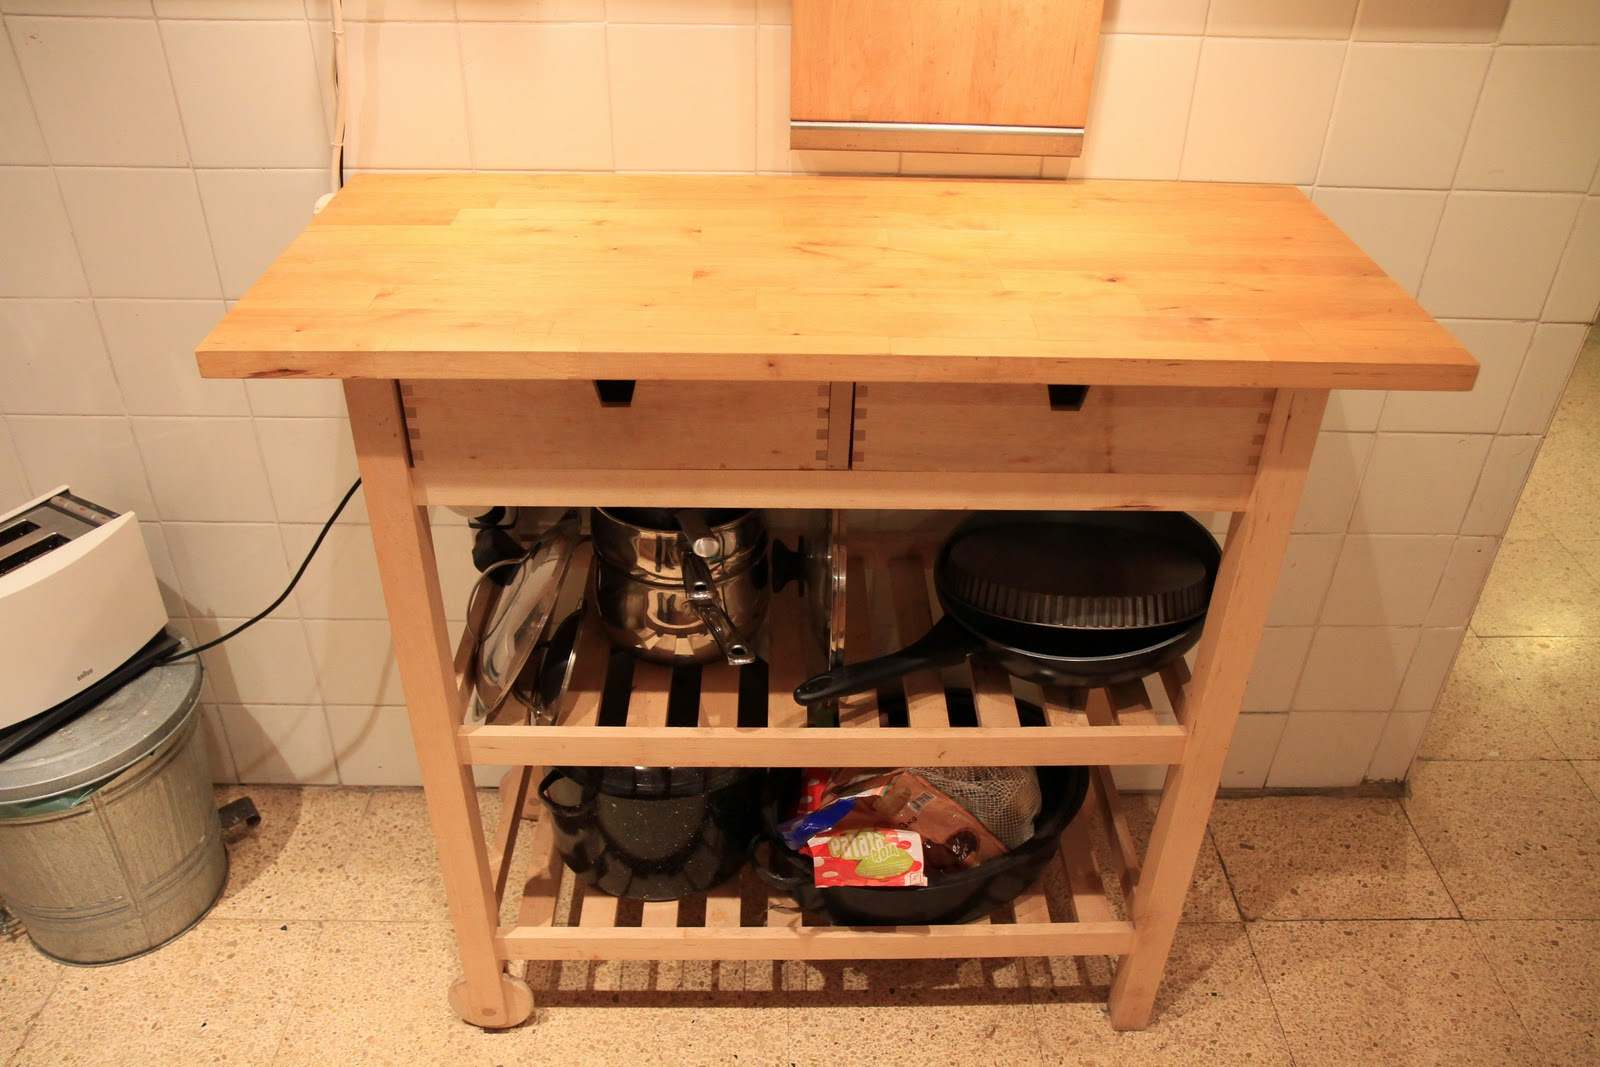 Ikea m s barato que ikea en bcn isla de cocina 39 f rh ja - Mas barato que ikea ...